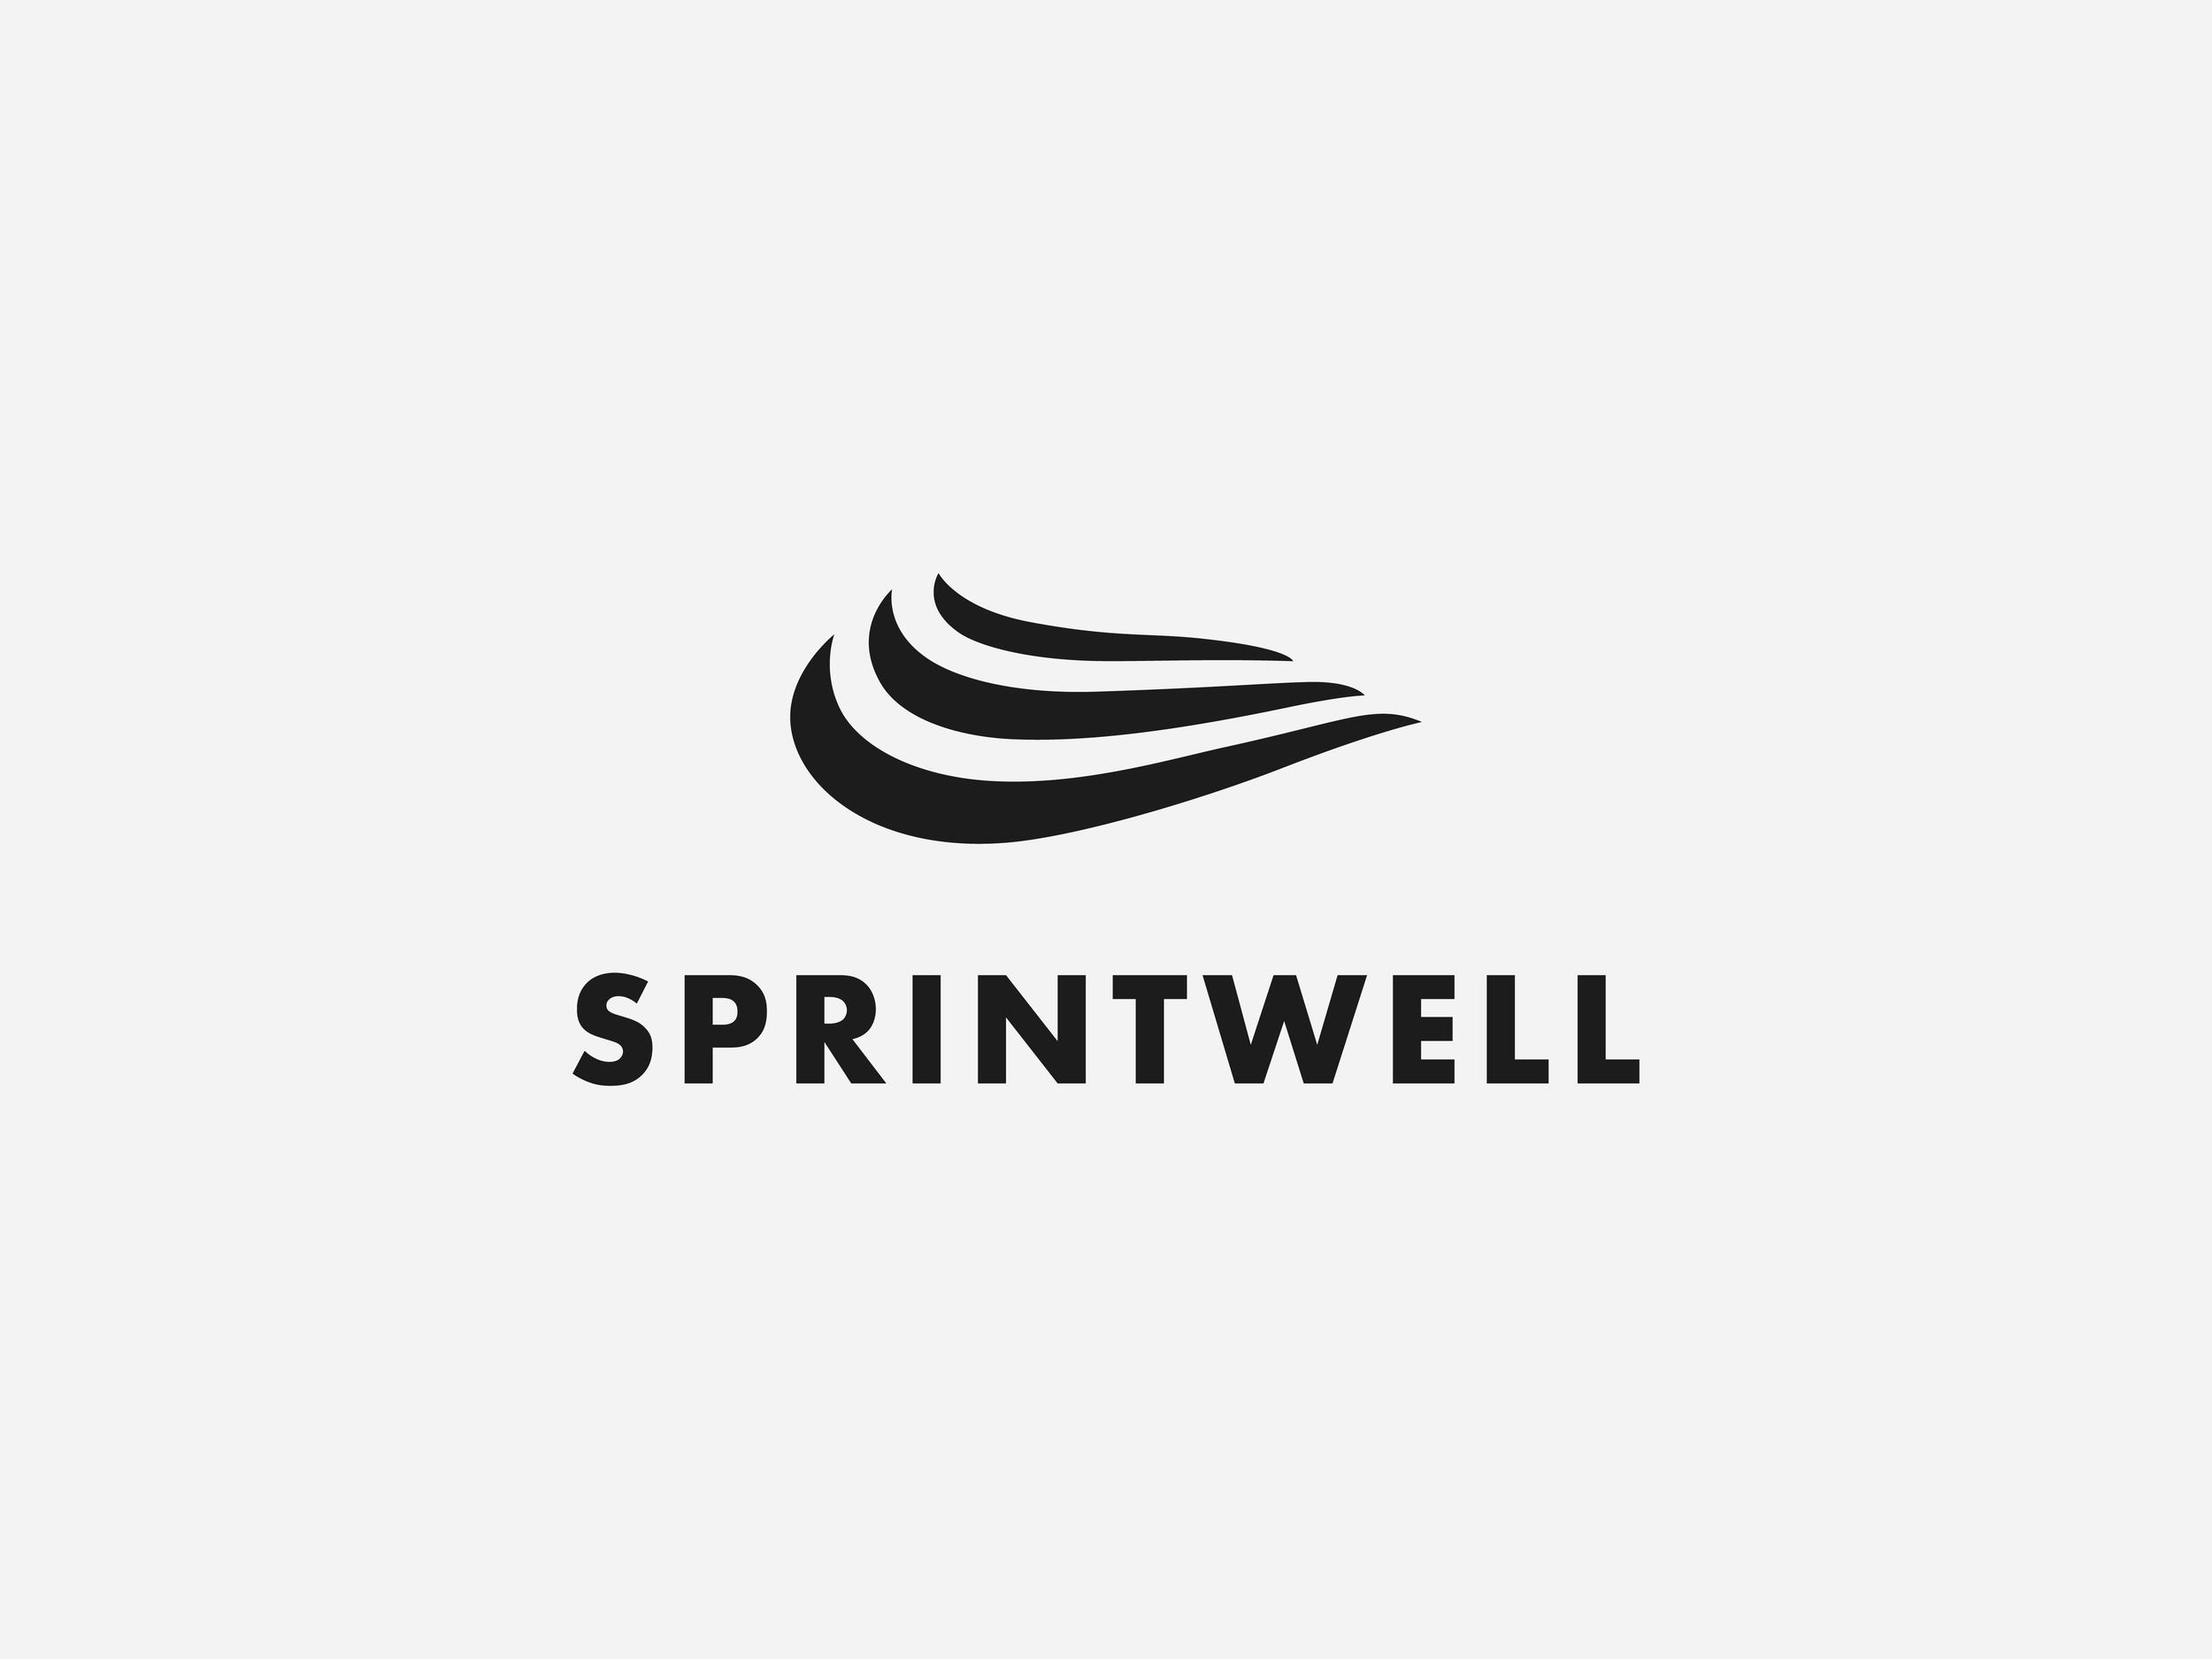 Sprintwell-LogoExplorations-01.png